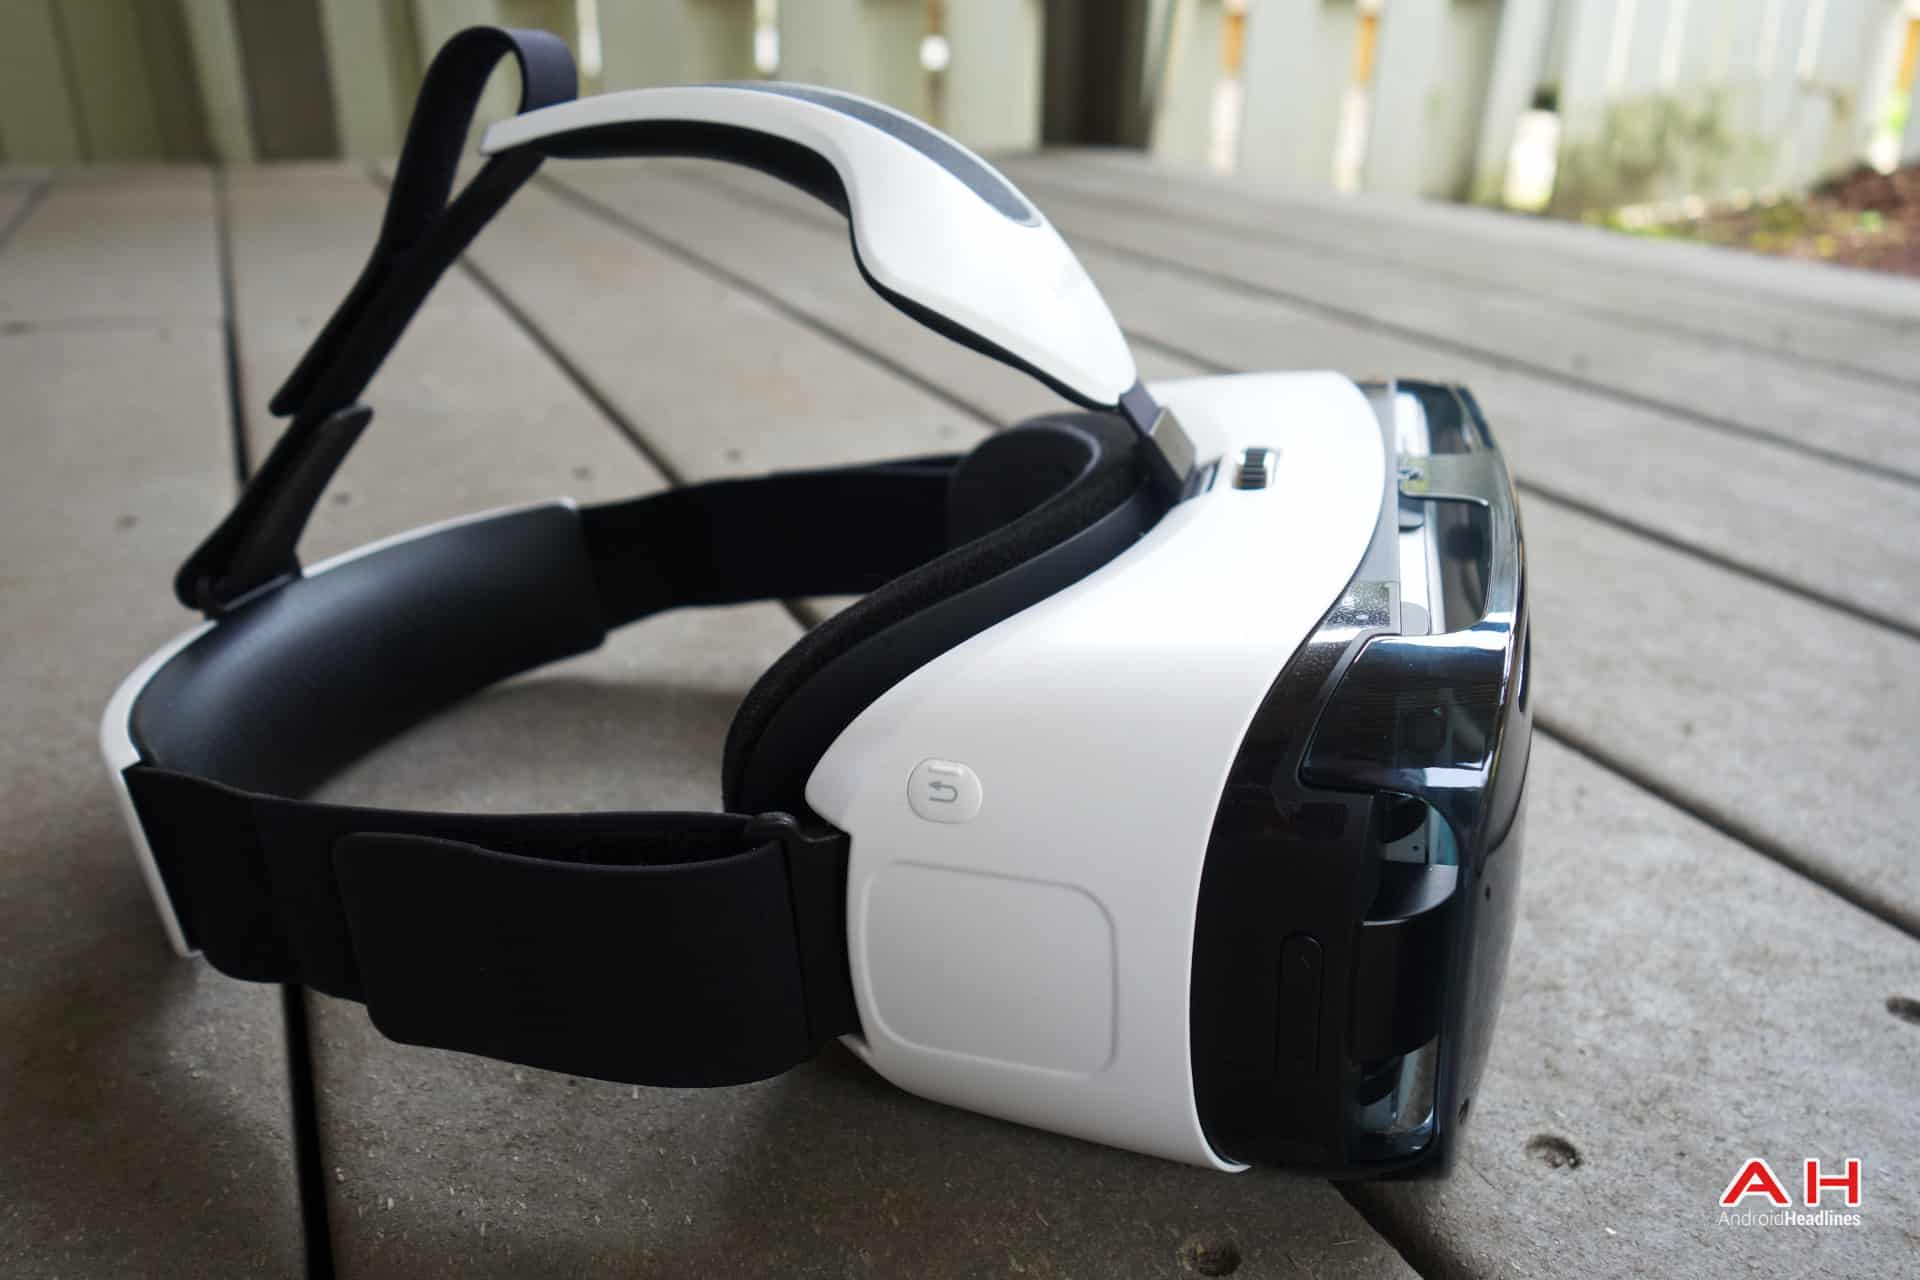 AH Samsung Gear VR-11